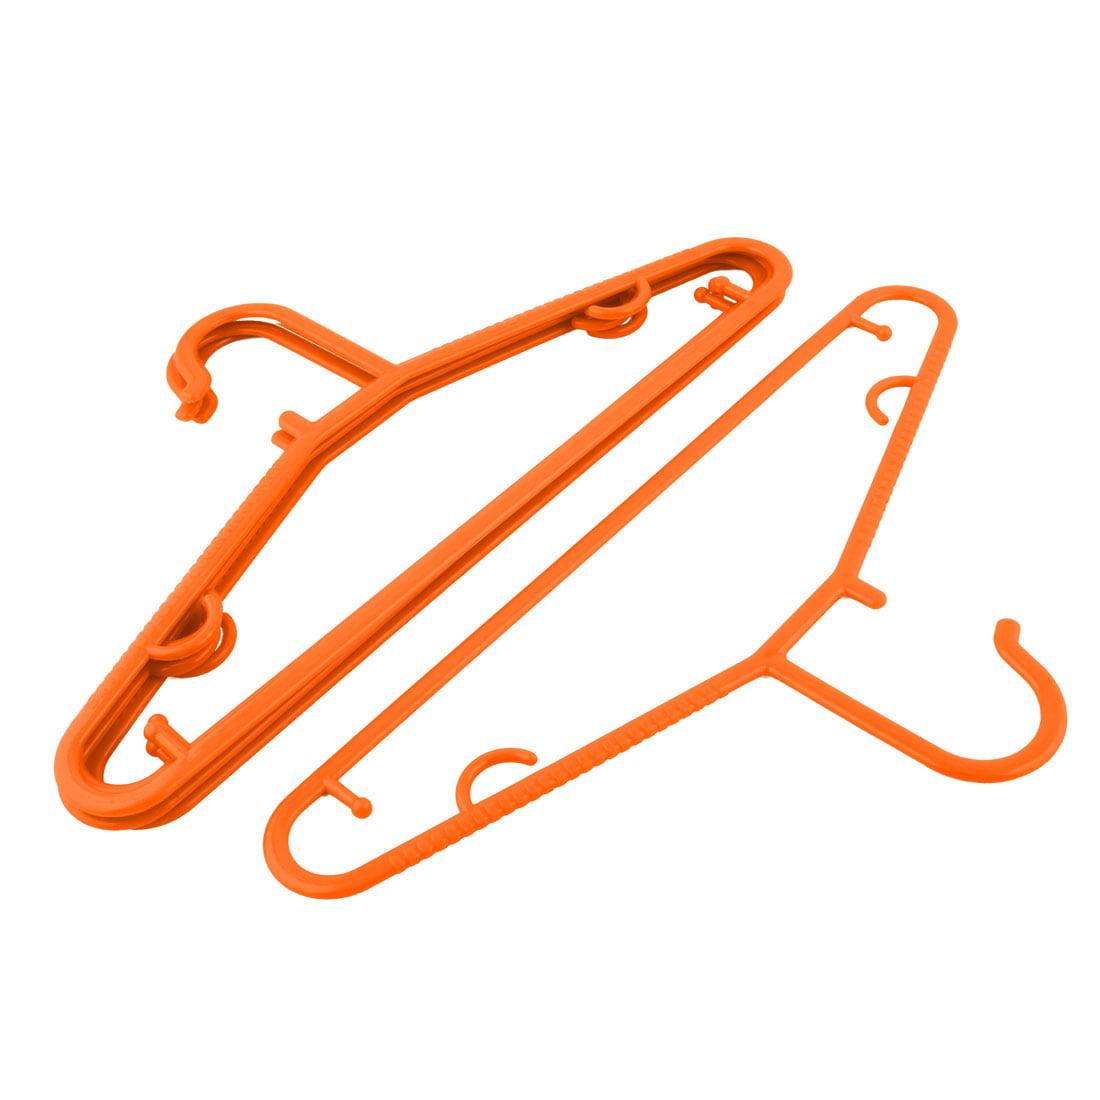 Household Plastic Clothes Underwear T-shirt Pants Holder Rack Hanger Orange 5pcs